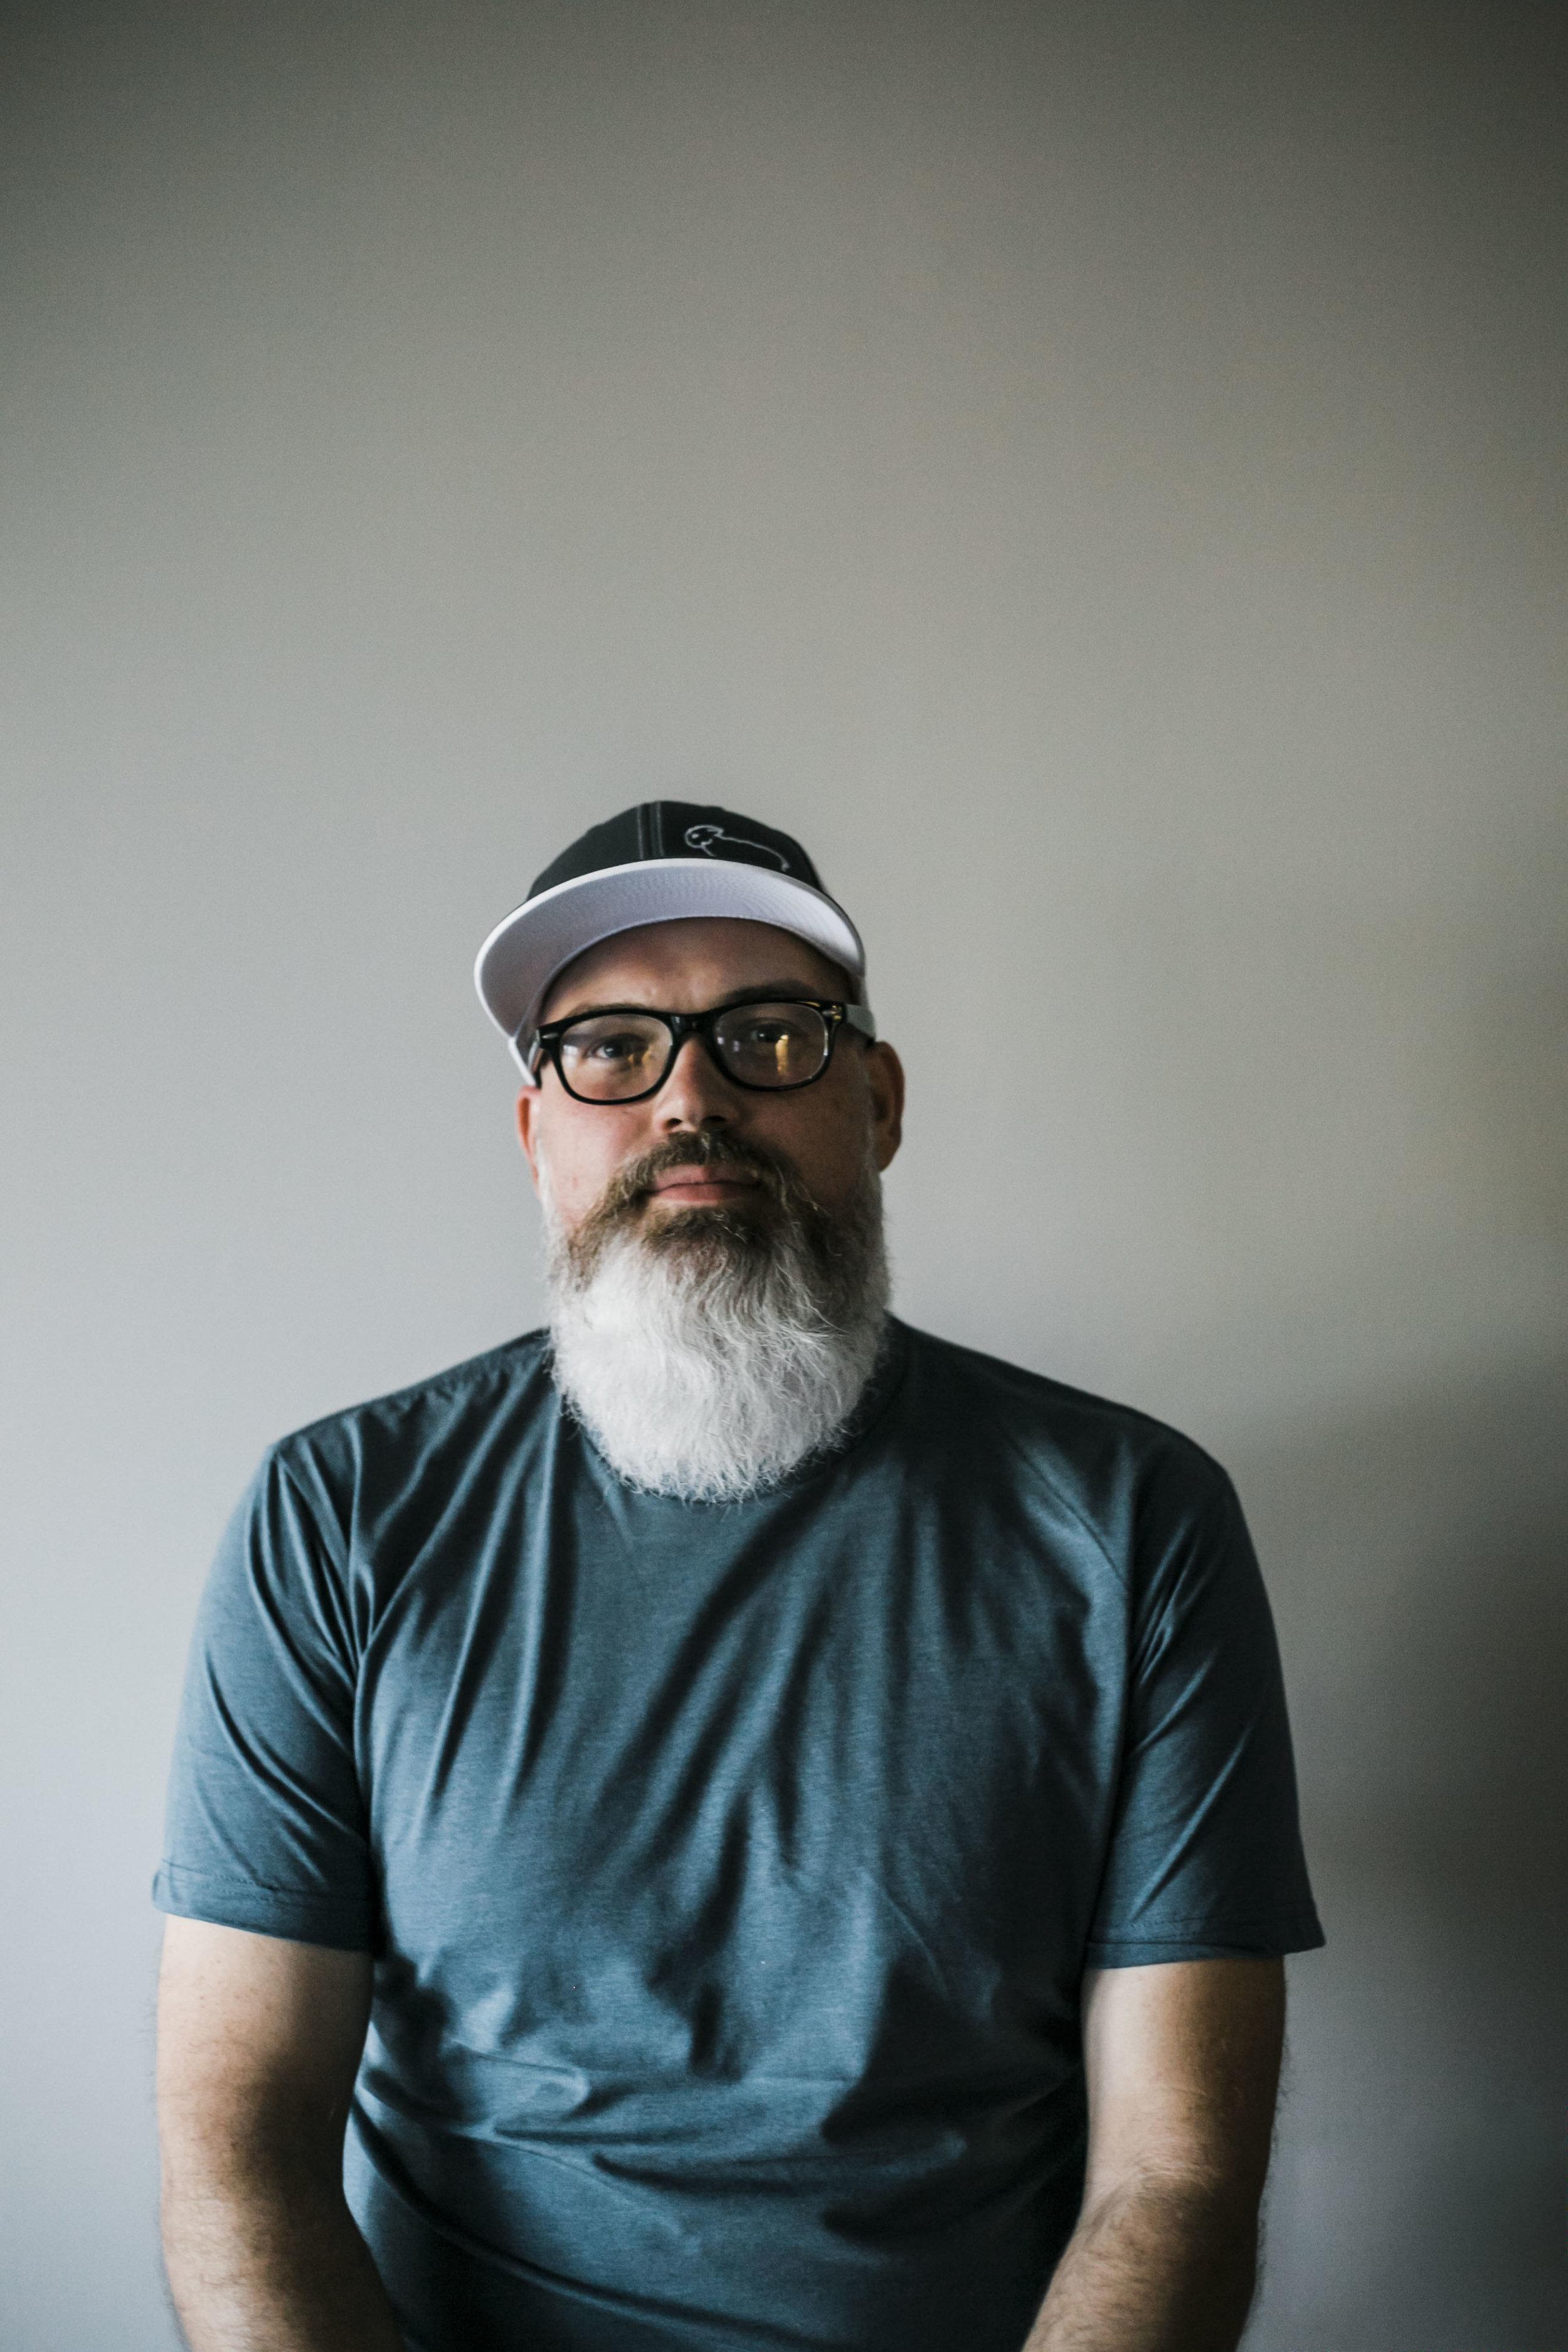 Knoxville Commercial Headshot Photographer Jason Goins Blacksheep Printing